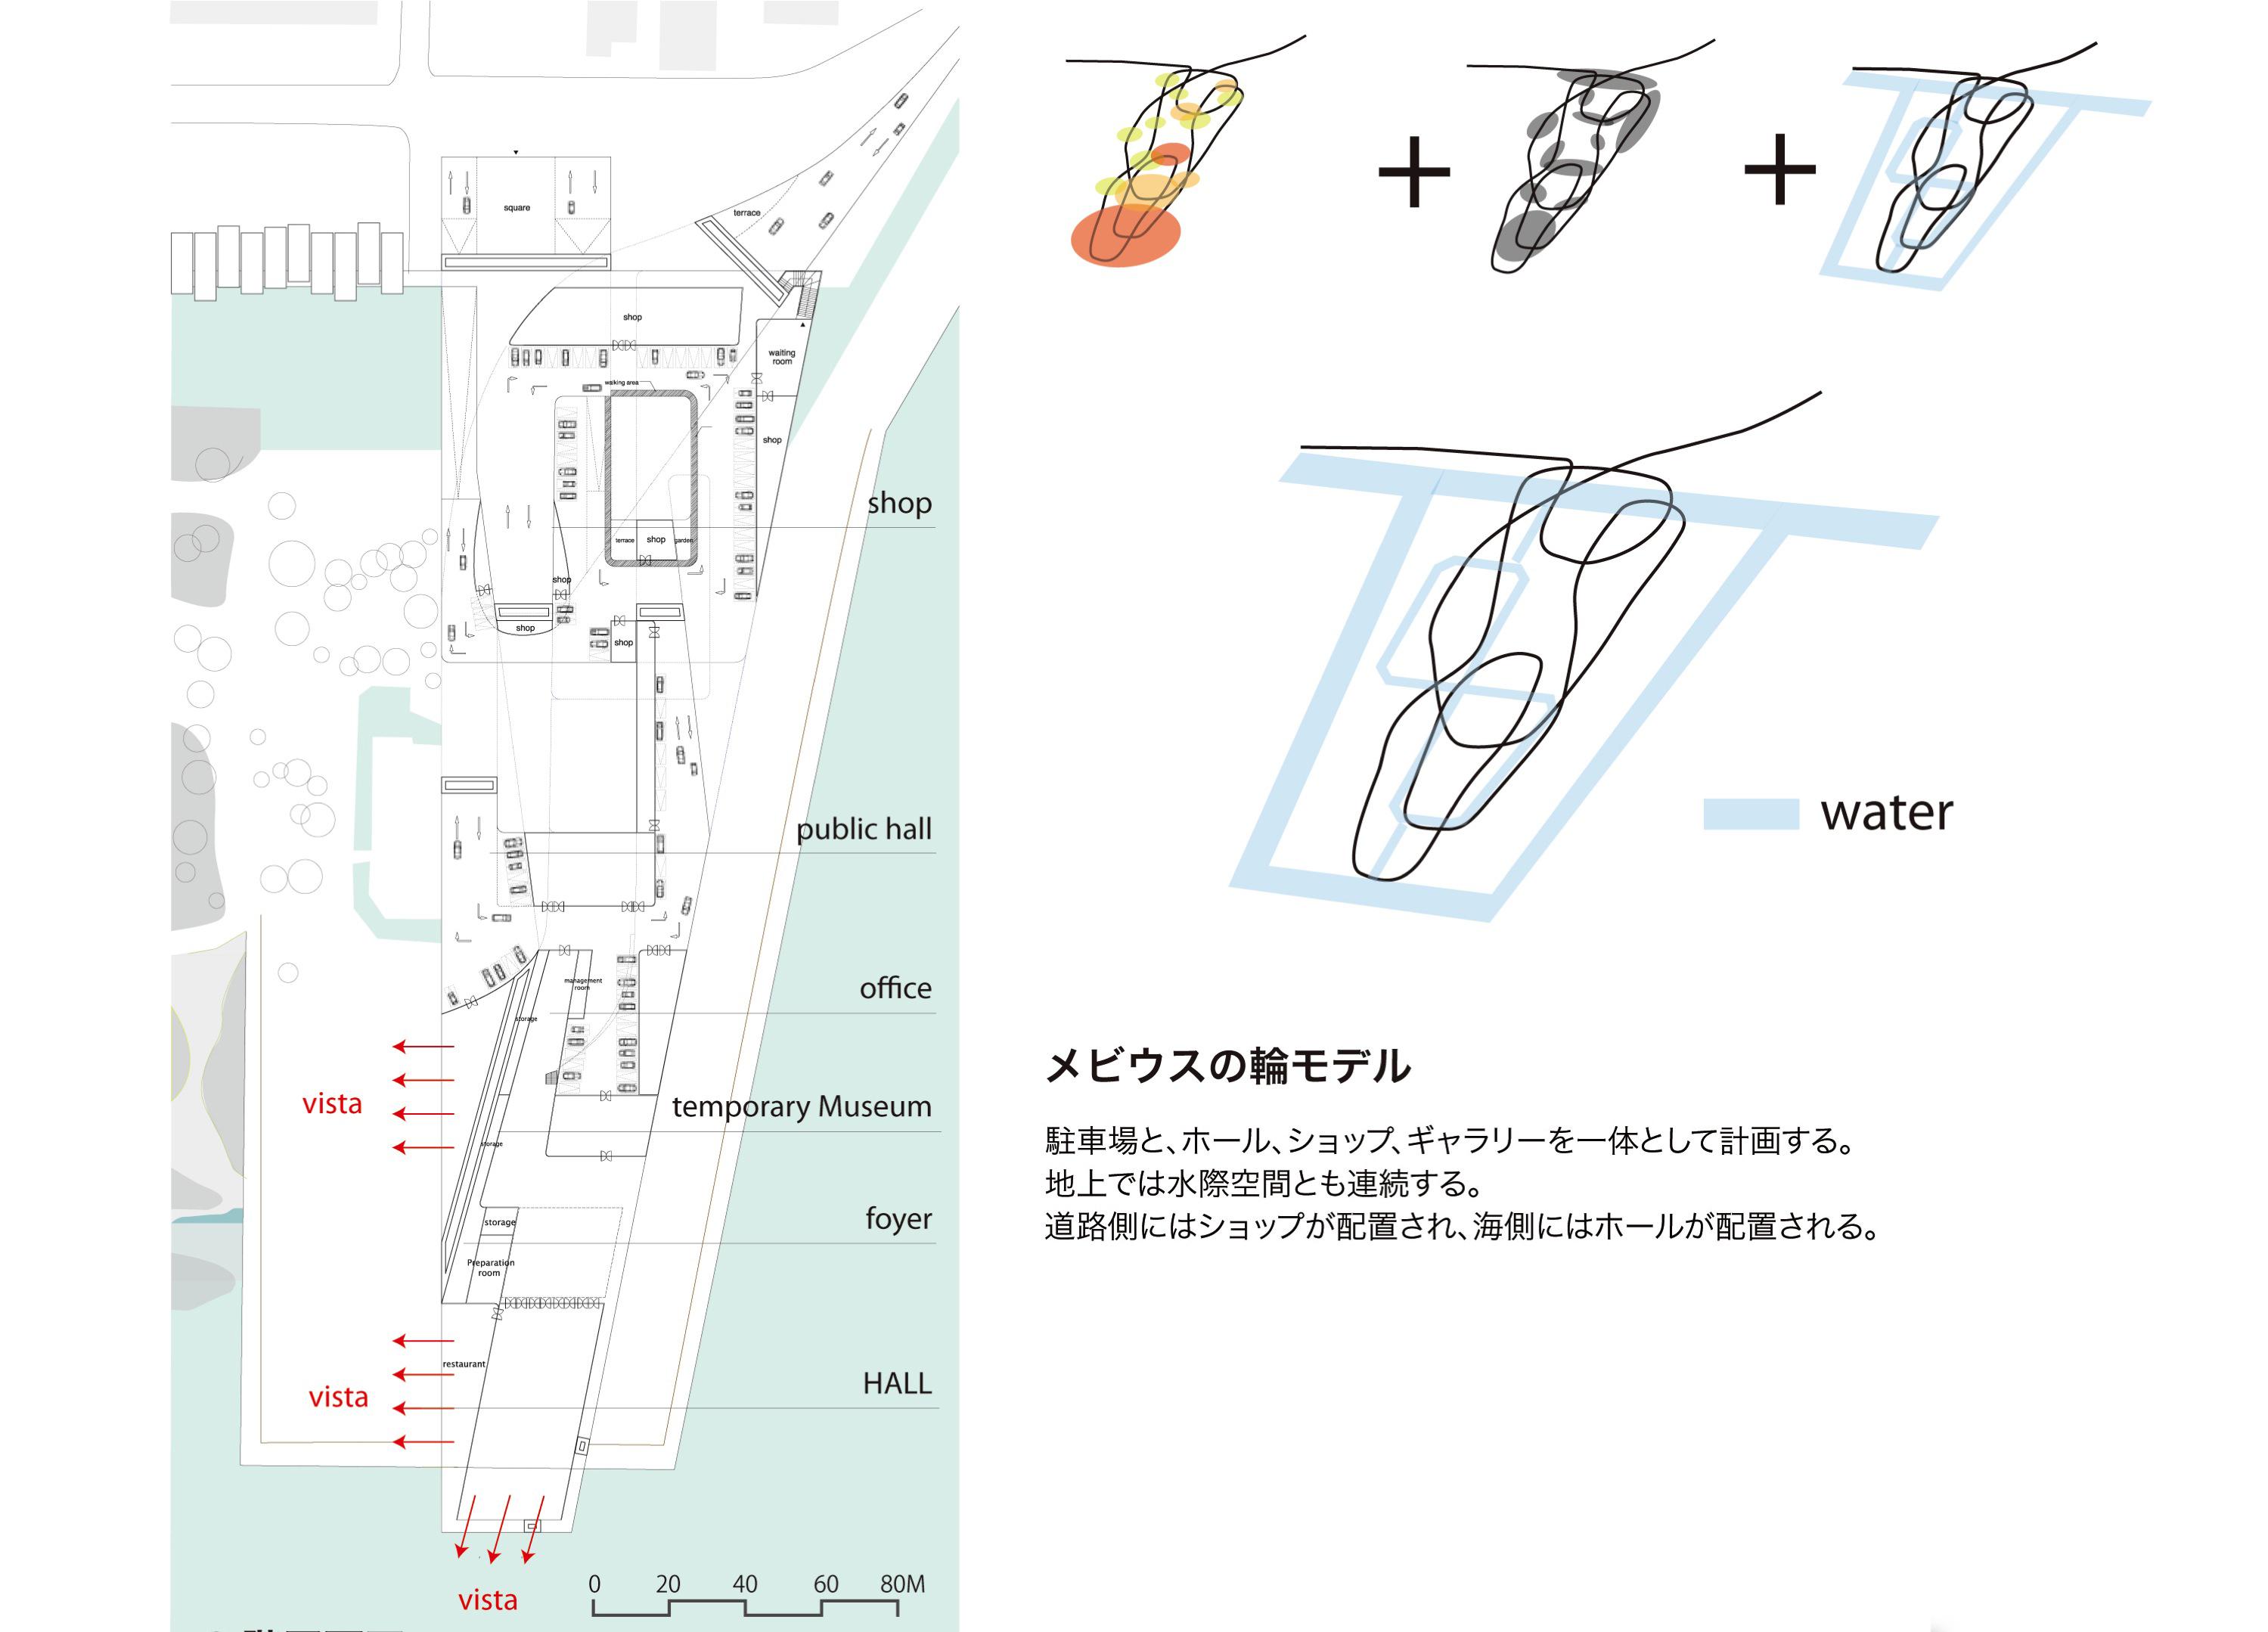 wataerjunction4